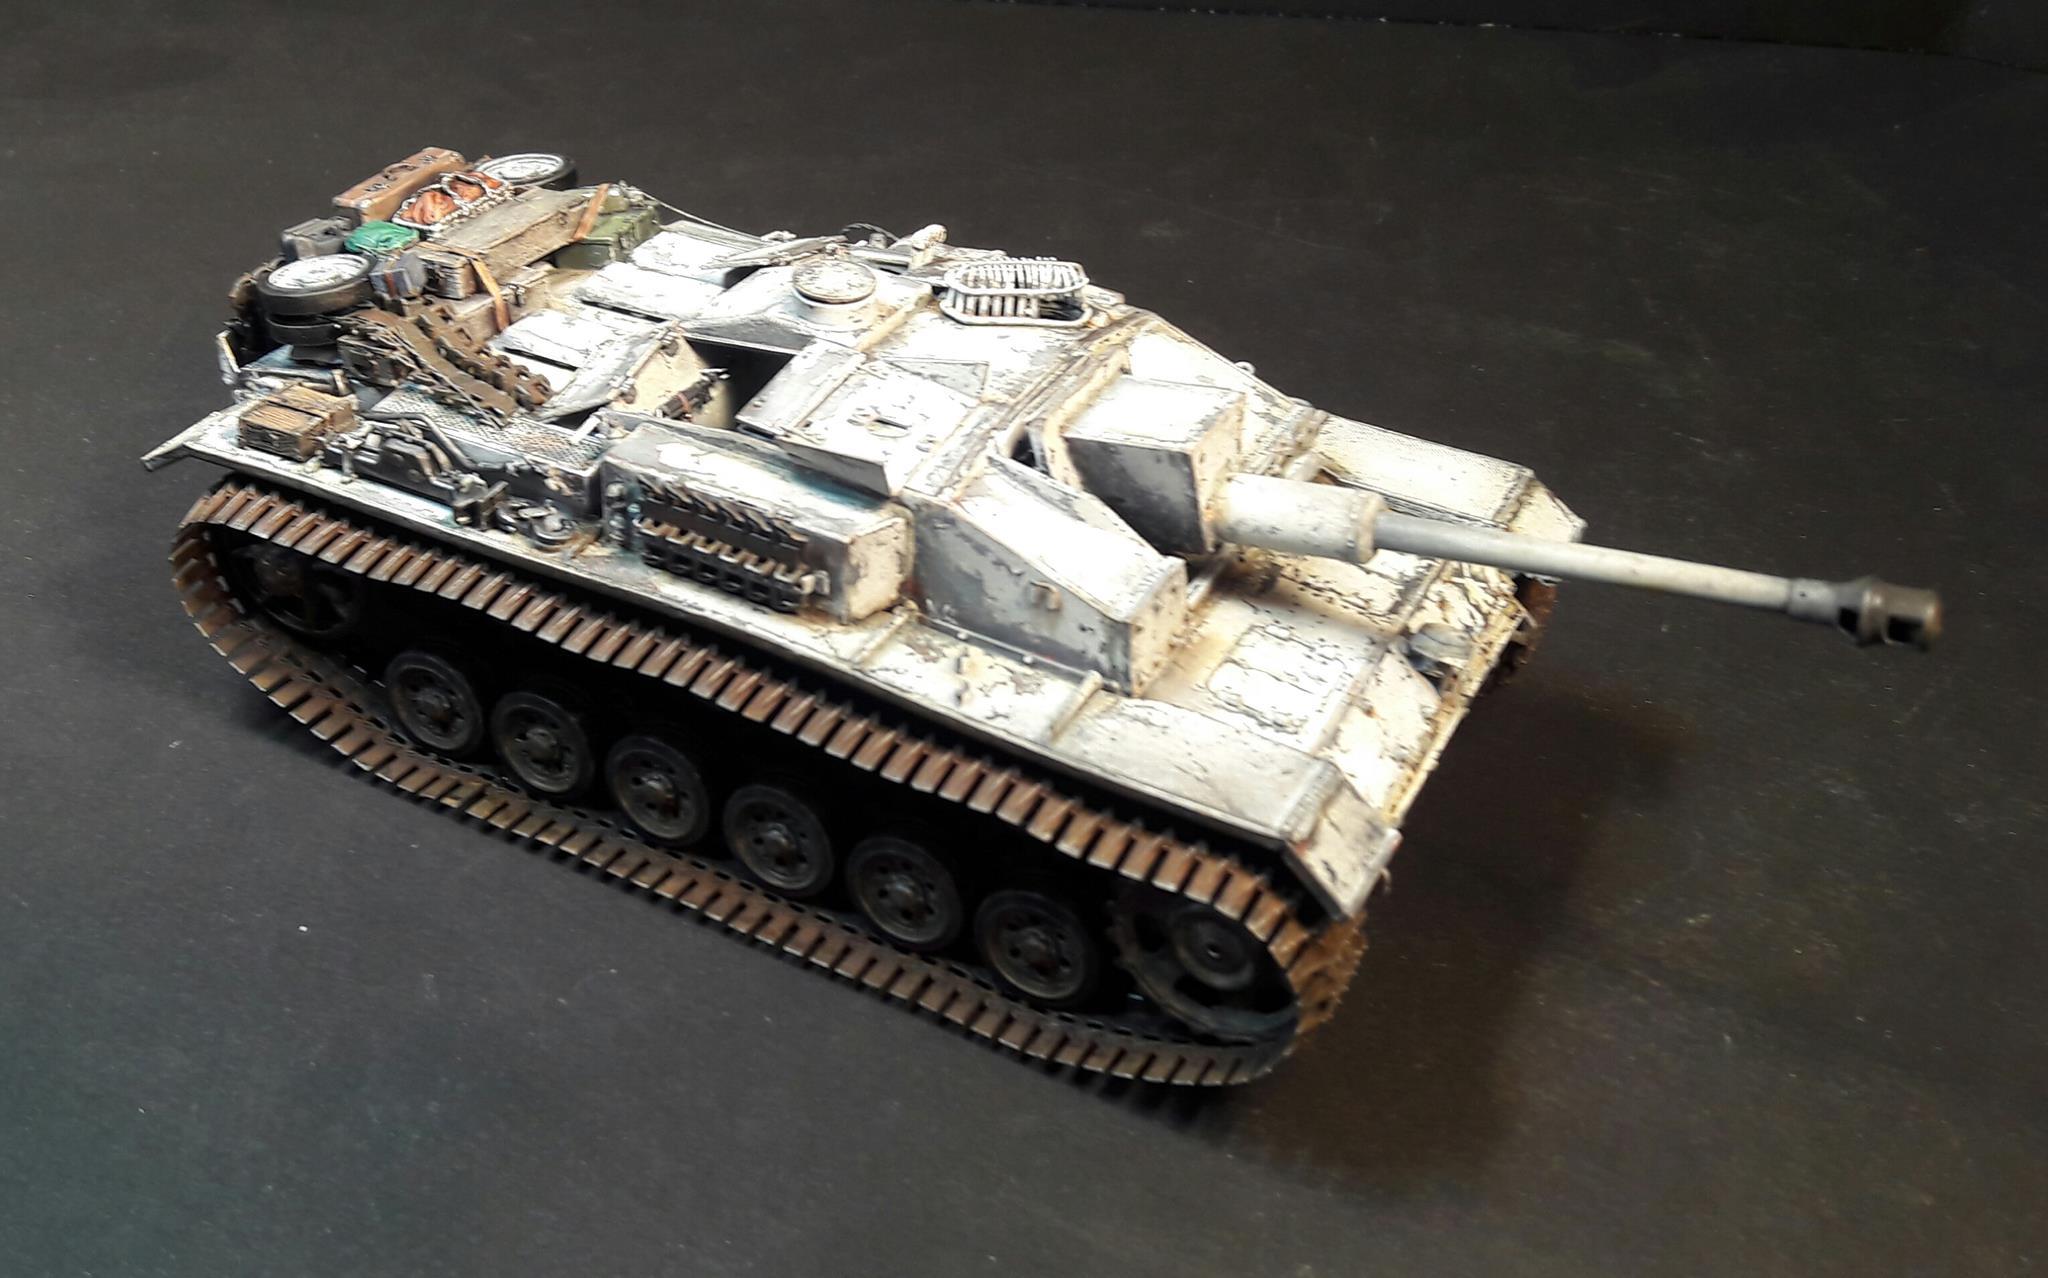 StuG.III Ausf.F/8 late production w/Winterketten - 1/35 - Page 2 5922152088344010212098511512590187624748o